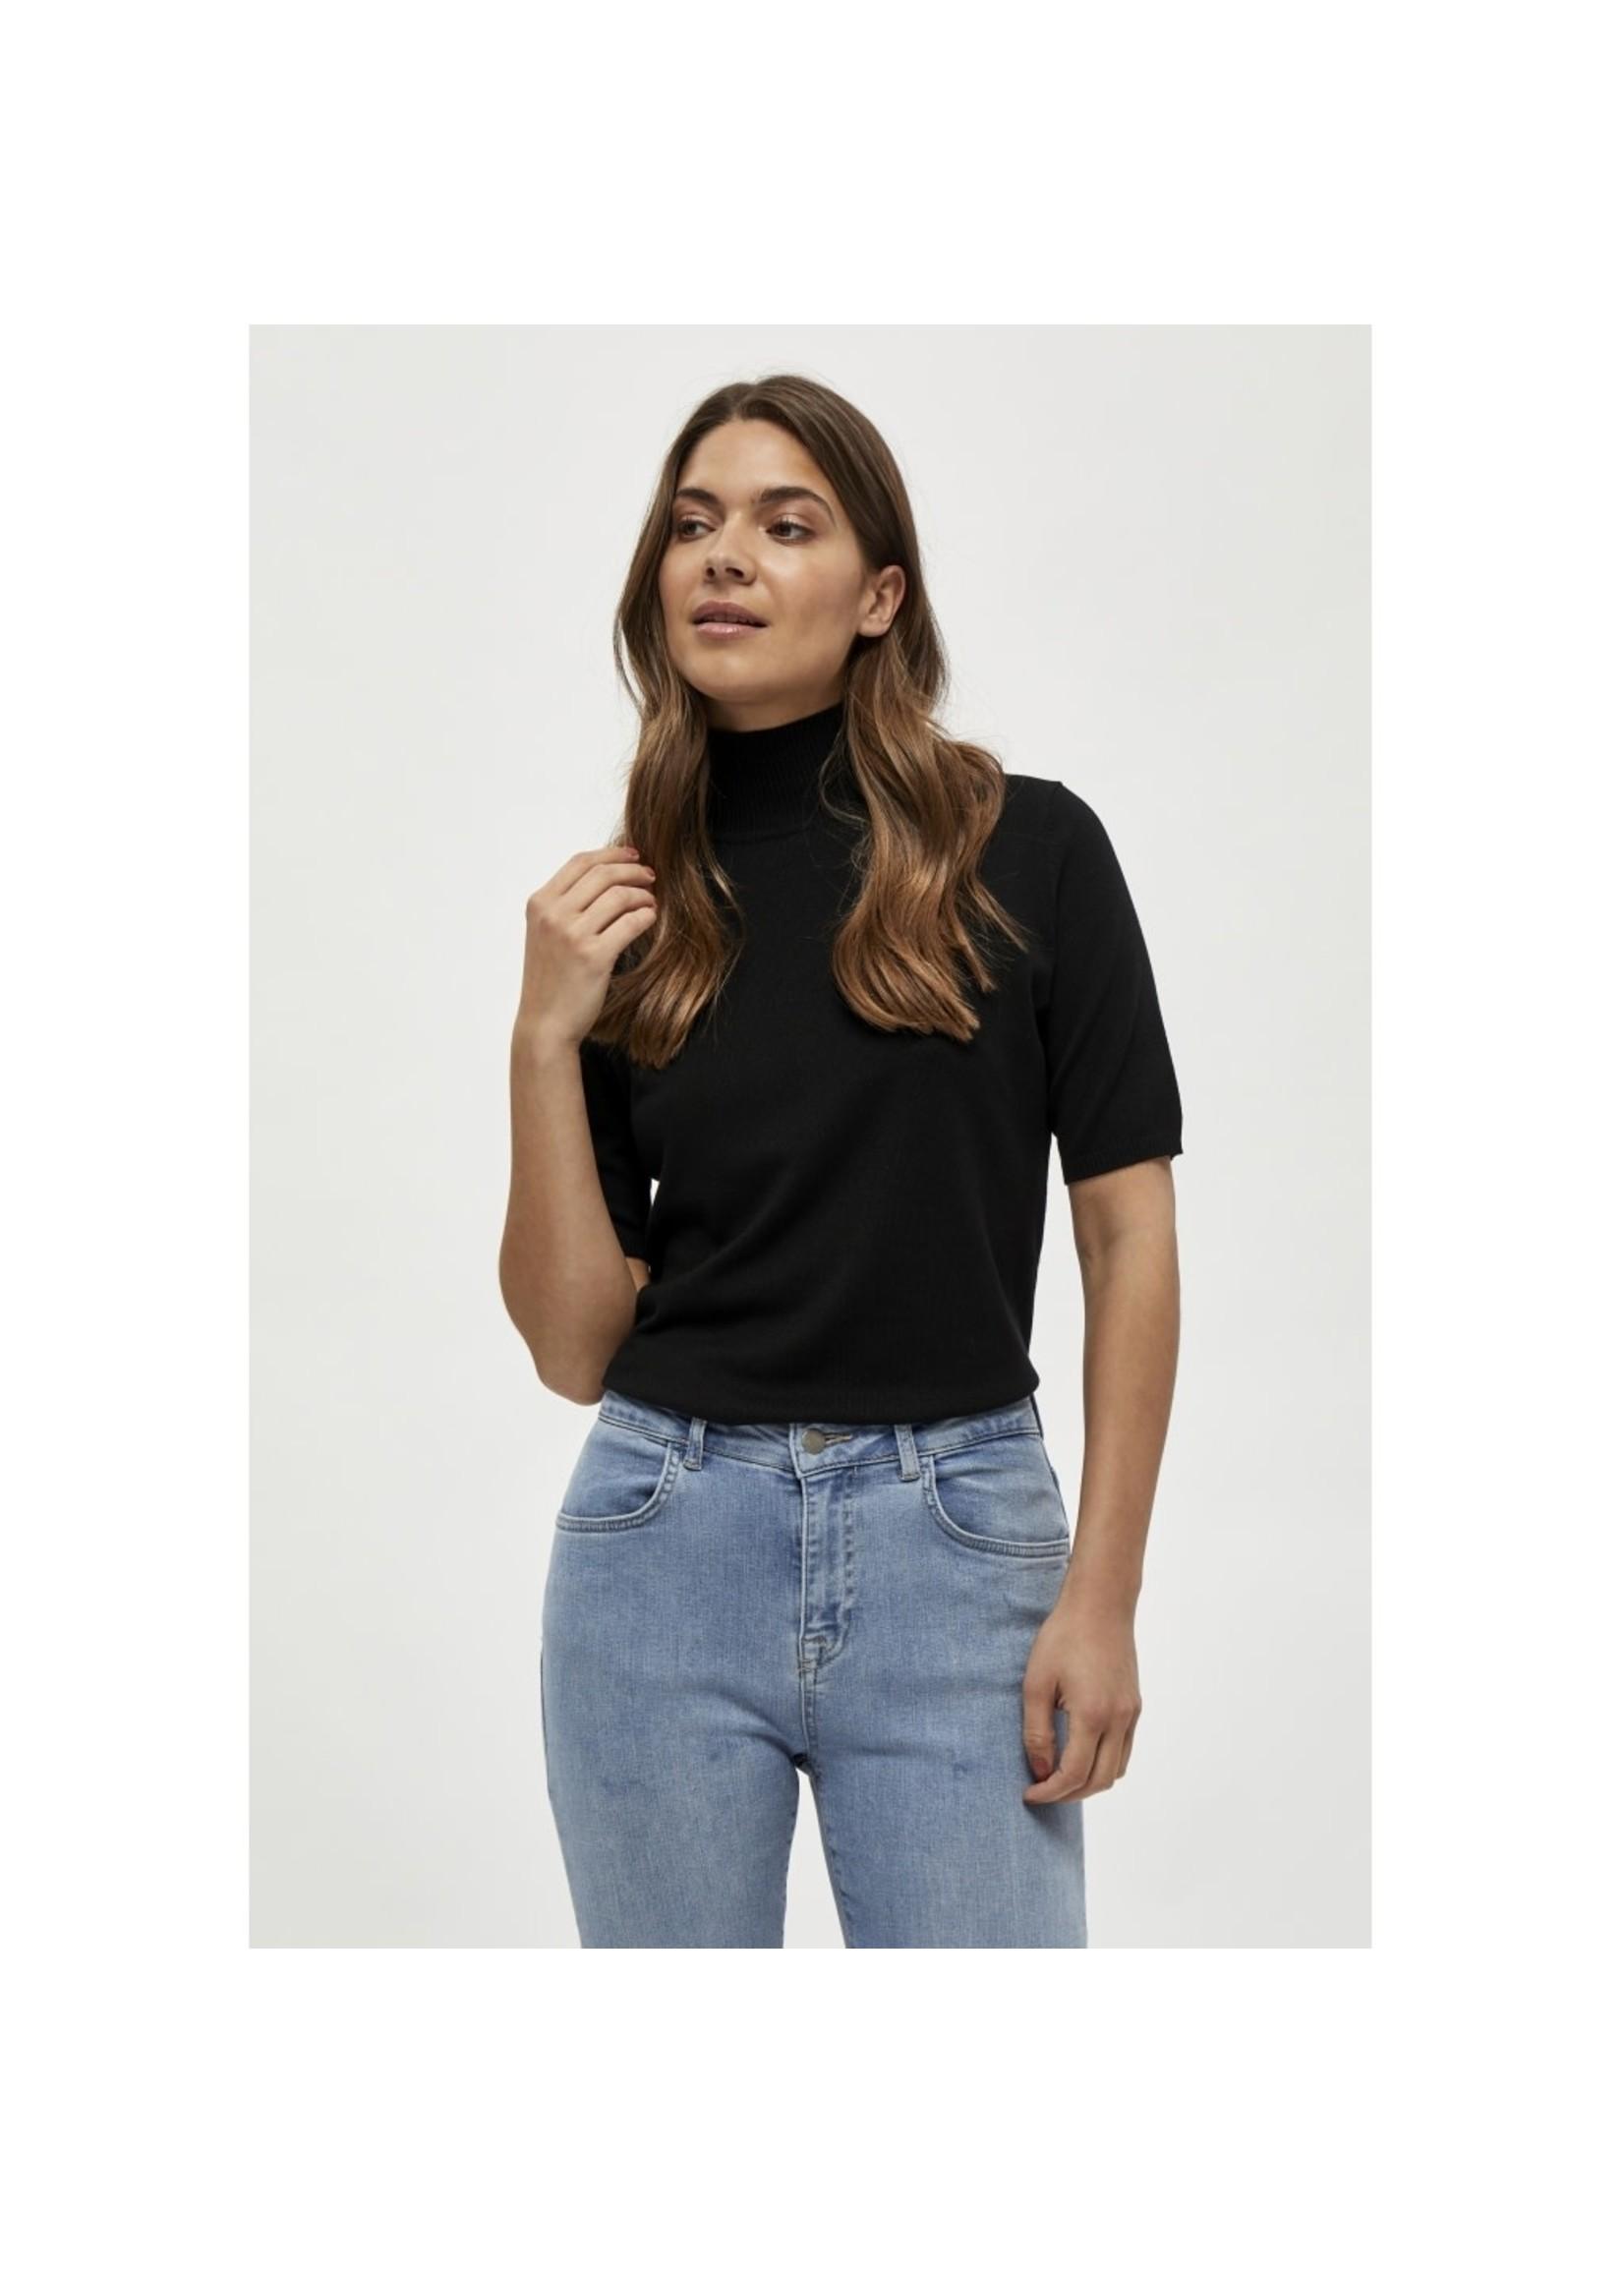 MINUS Lima shirt, black